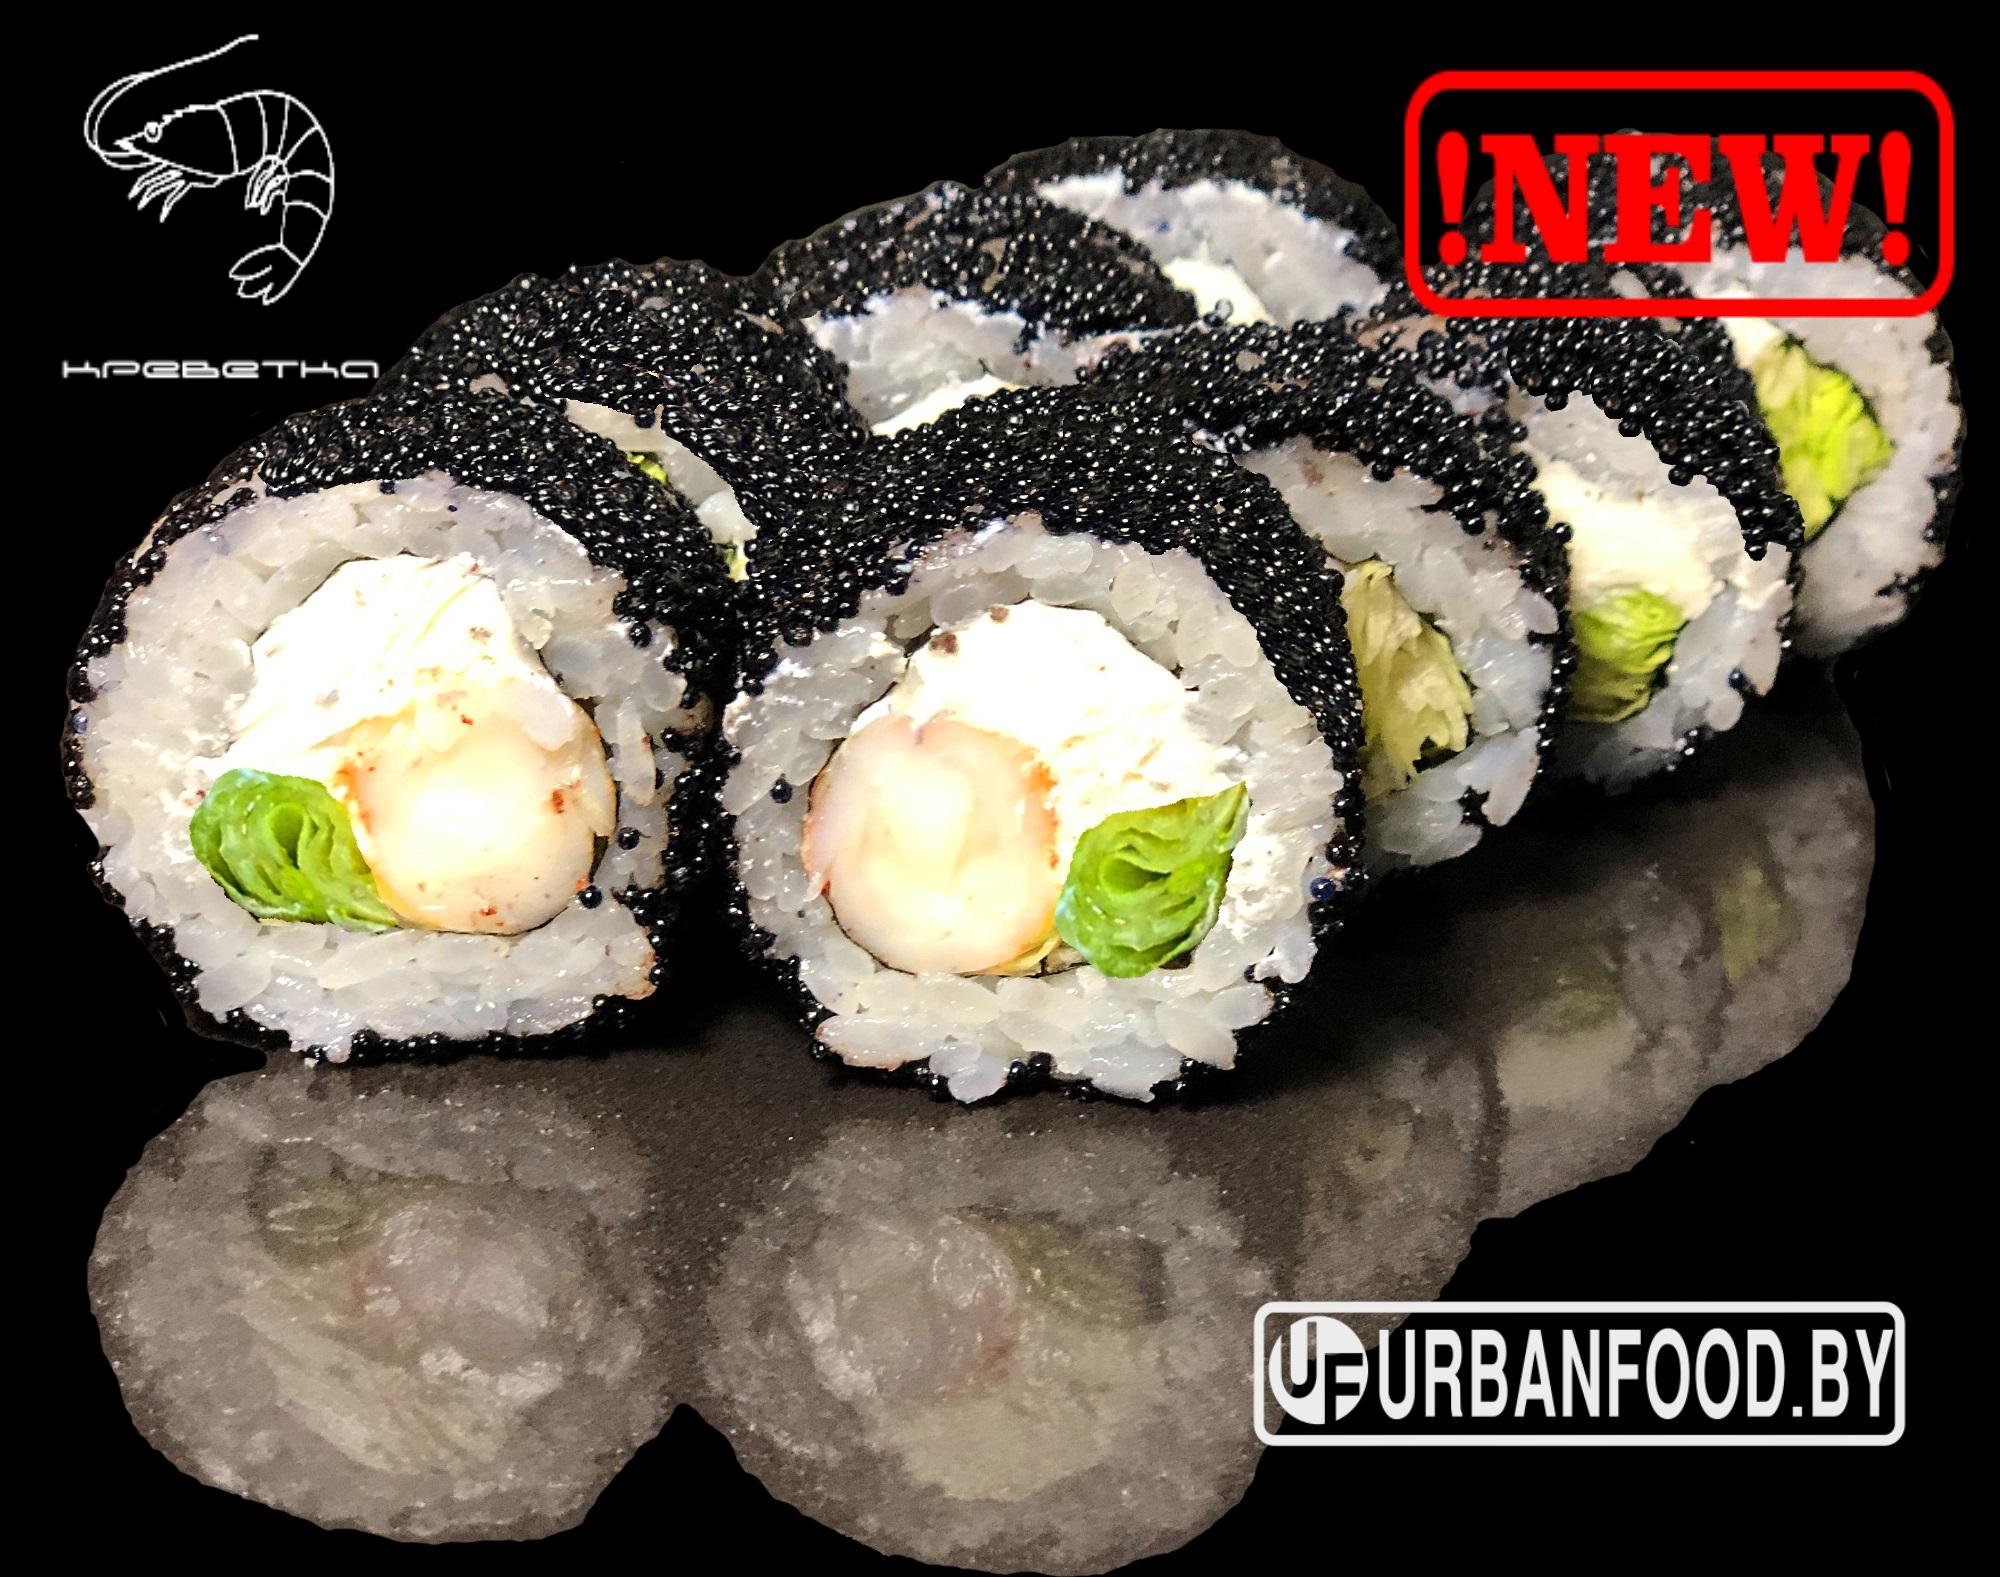 Oxford_urbanfood_sushi_minsk